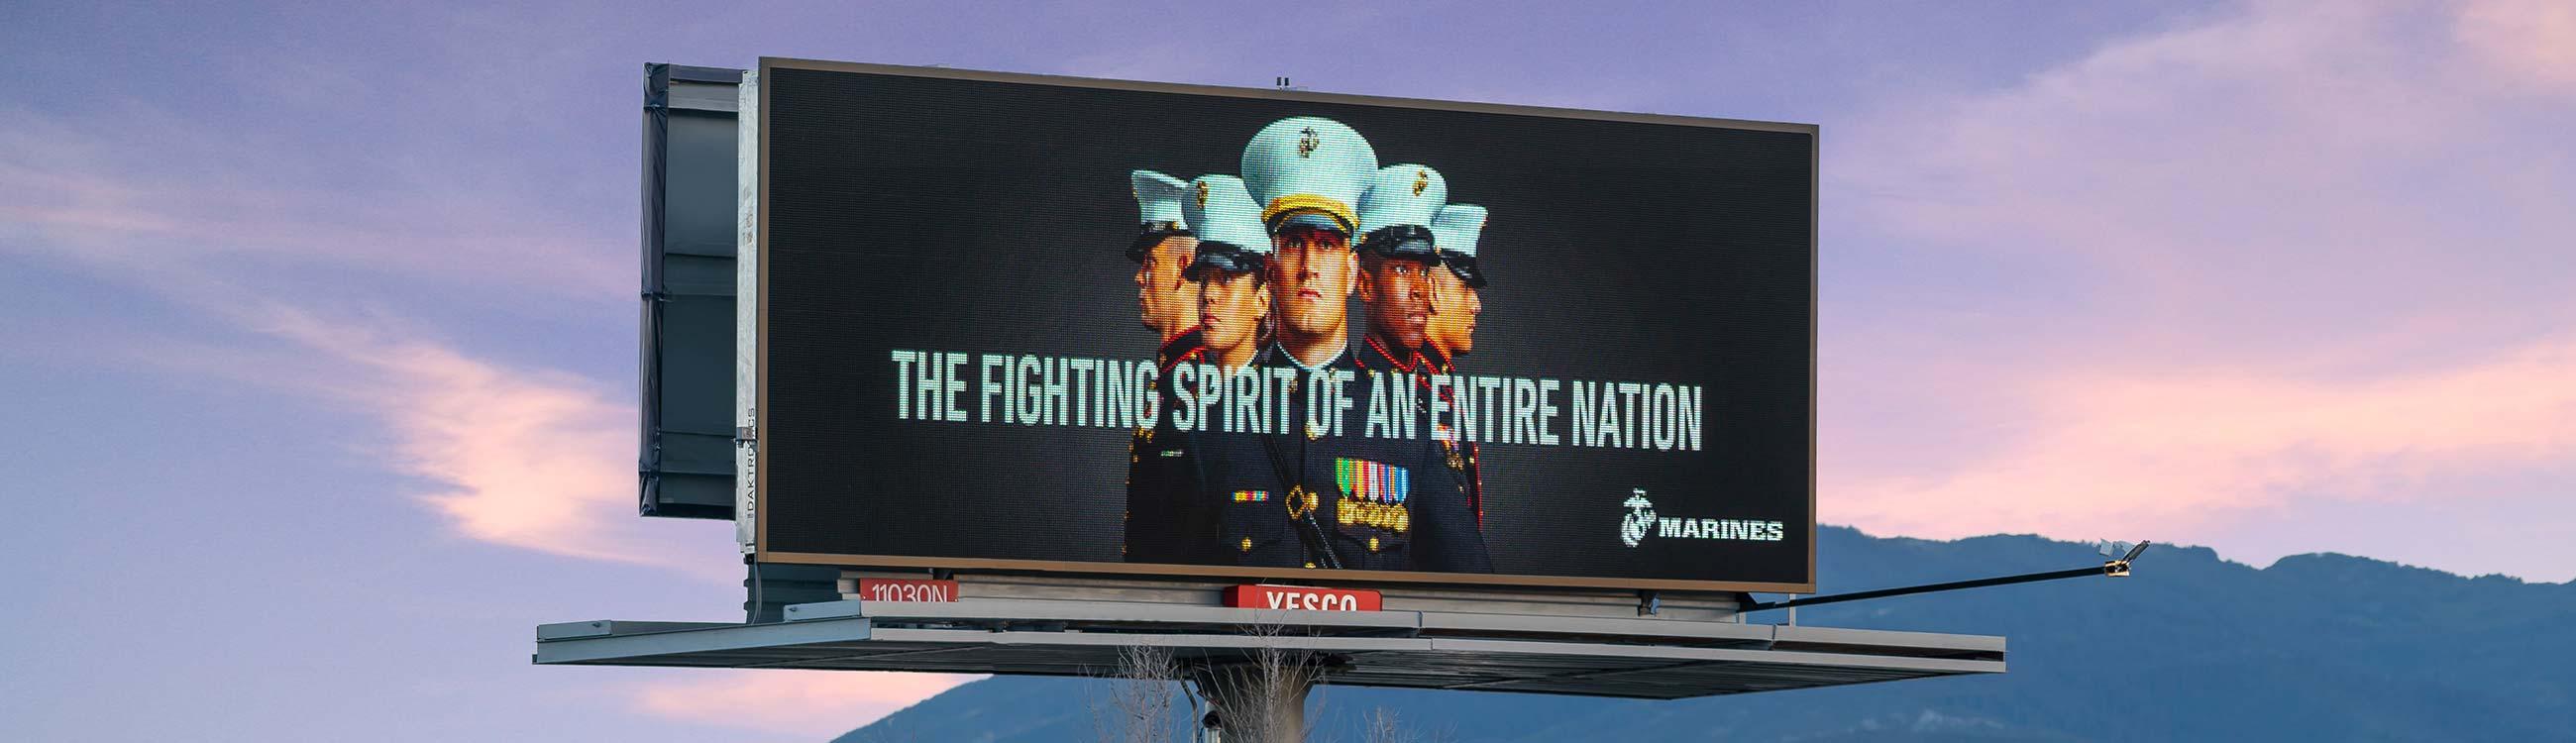 YESCO_billboard_2600x750